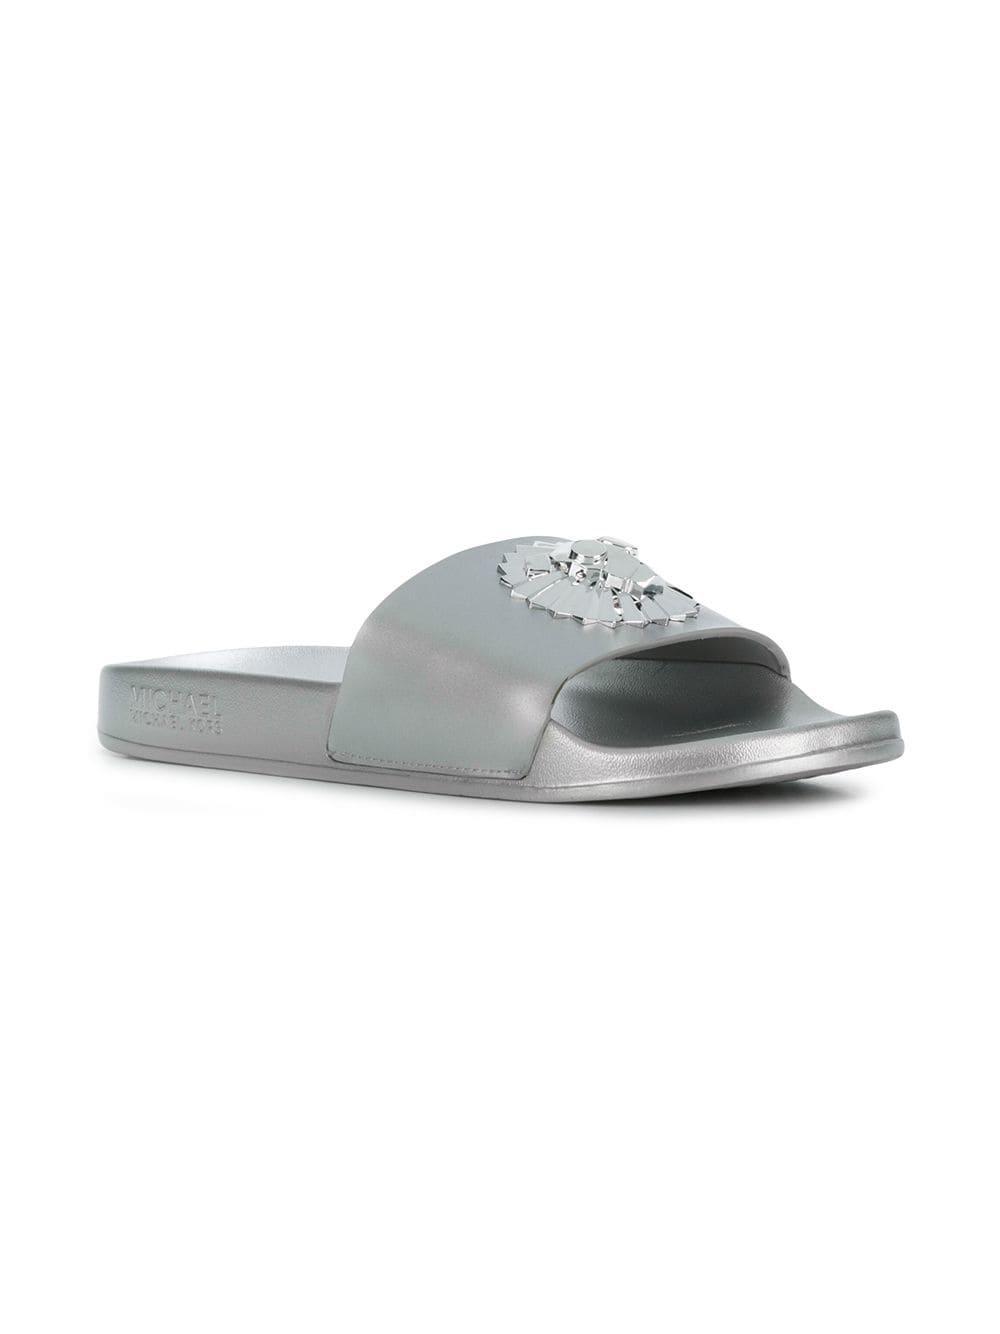 0354915607a1a MICHAEL Michael Kors Rory Metallic Slides in Metallic - Save 47% - Lyst